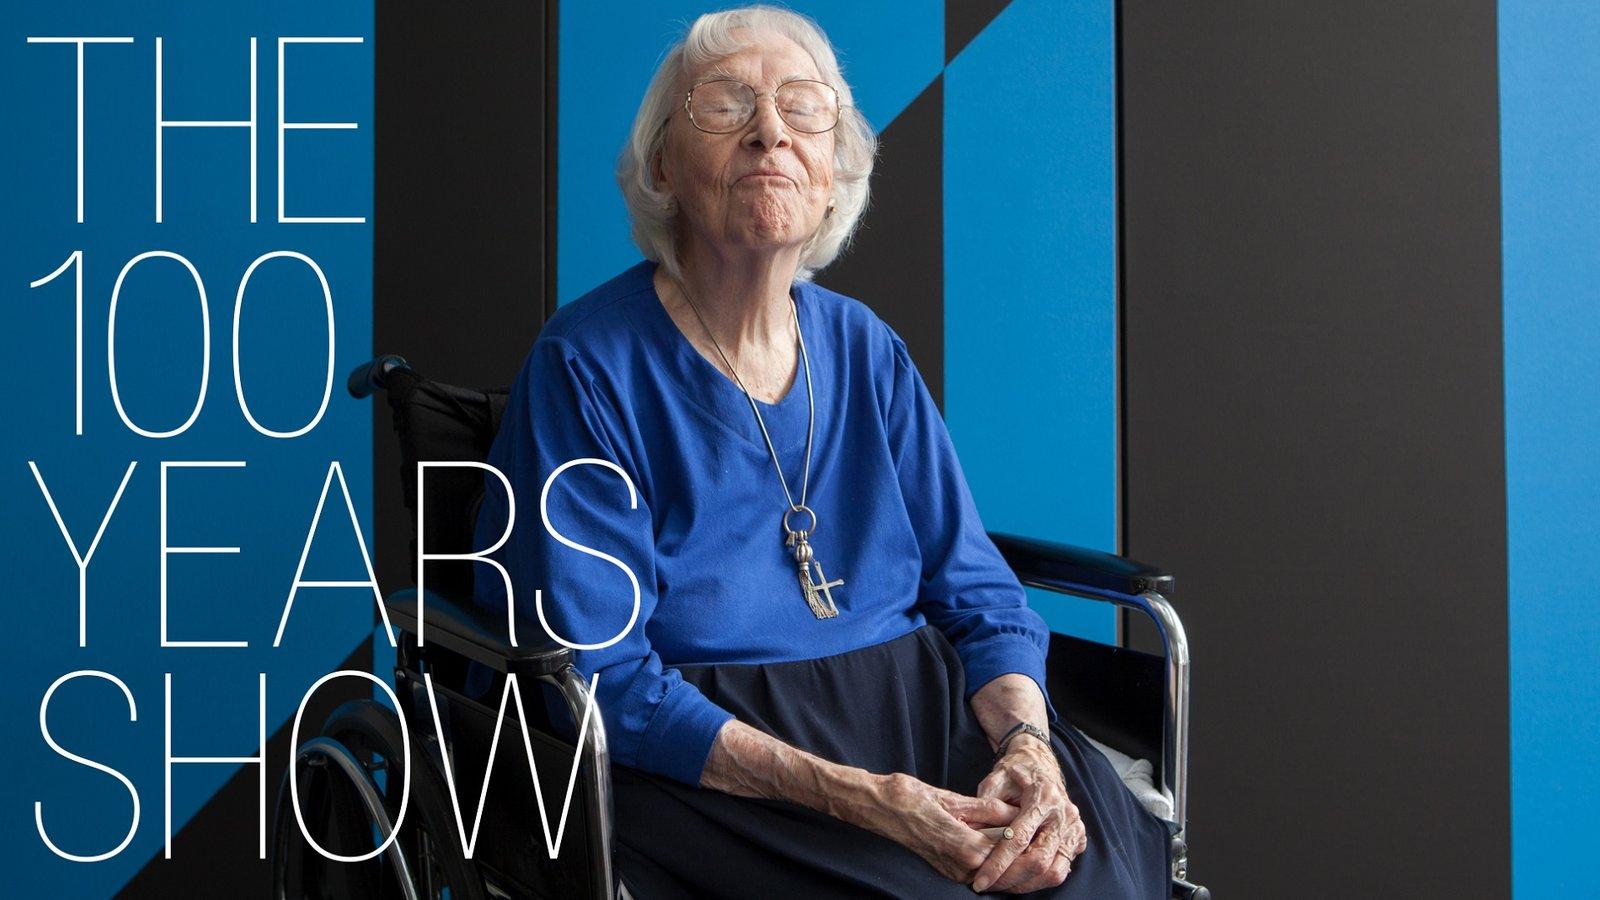 The 100 Years Show - Cuban-American Artist Carmen Herrera